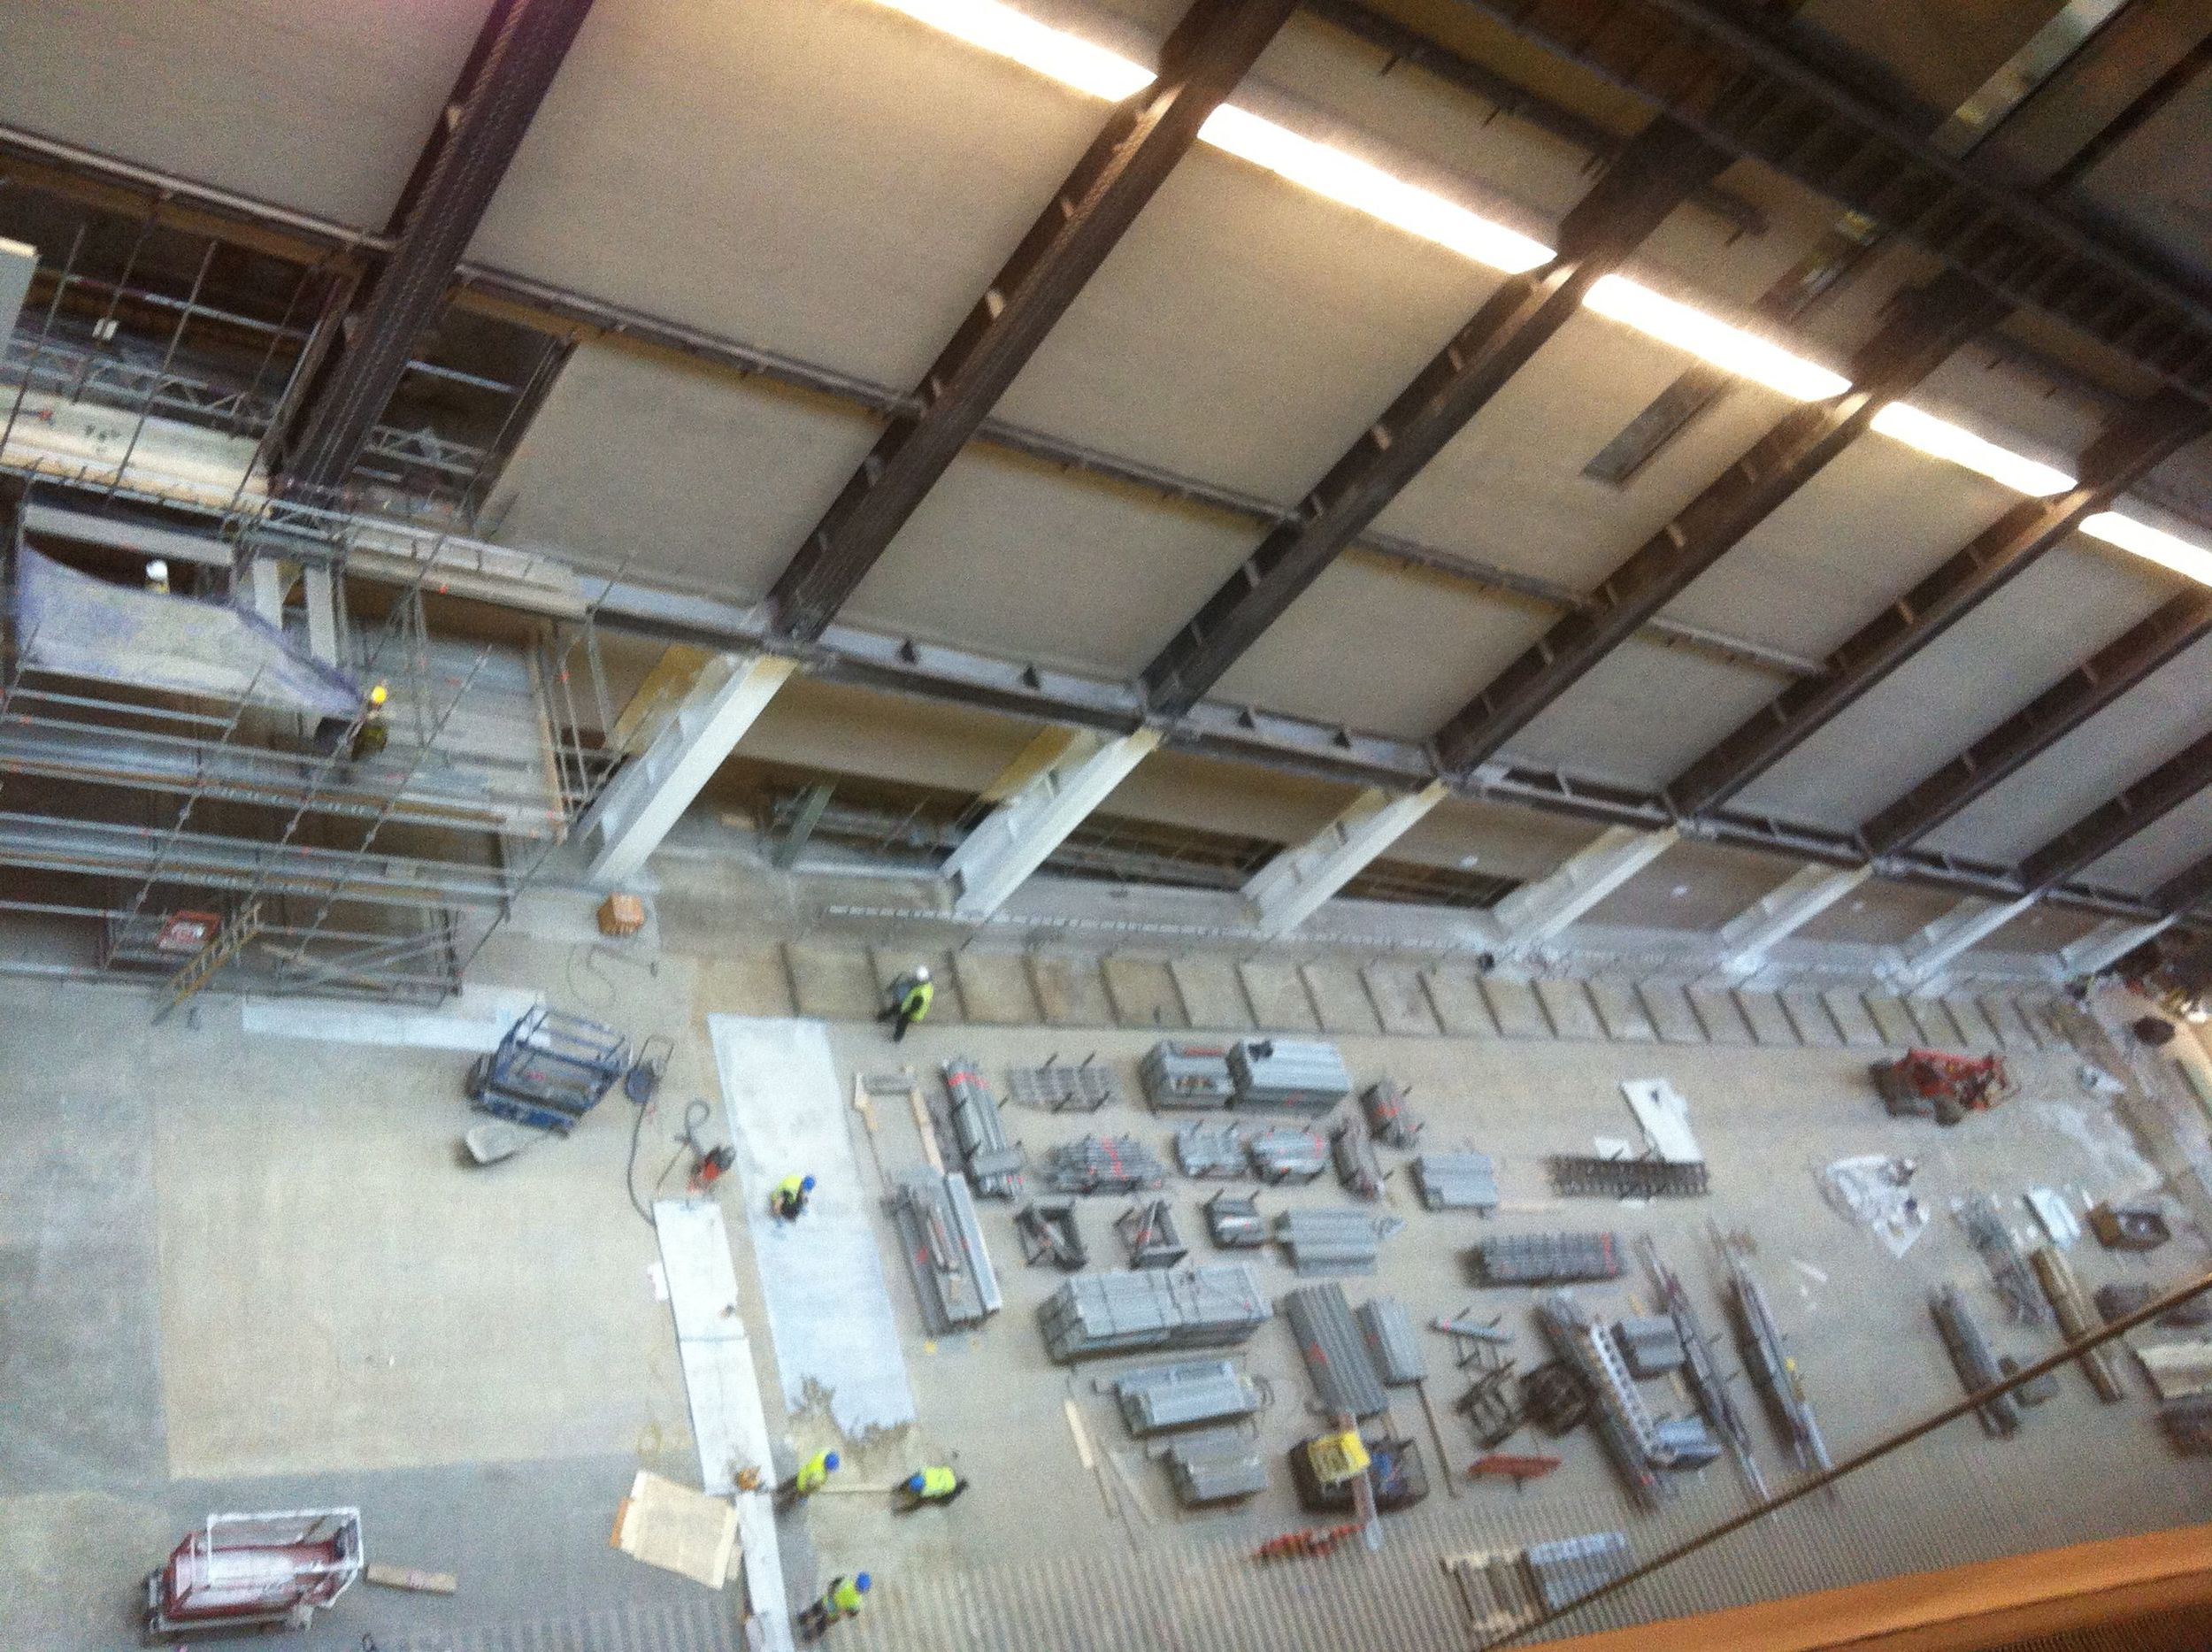 The Turbine Hall, underwraps @ Tate Modern 28.11.13